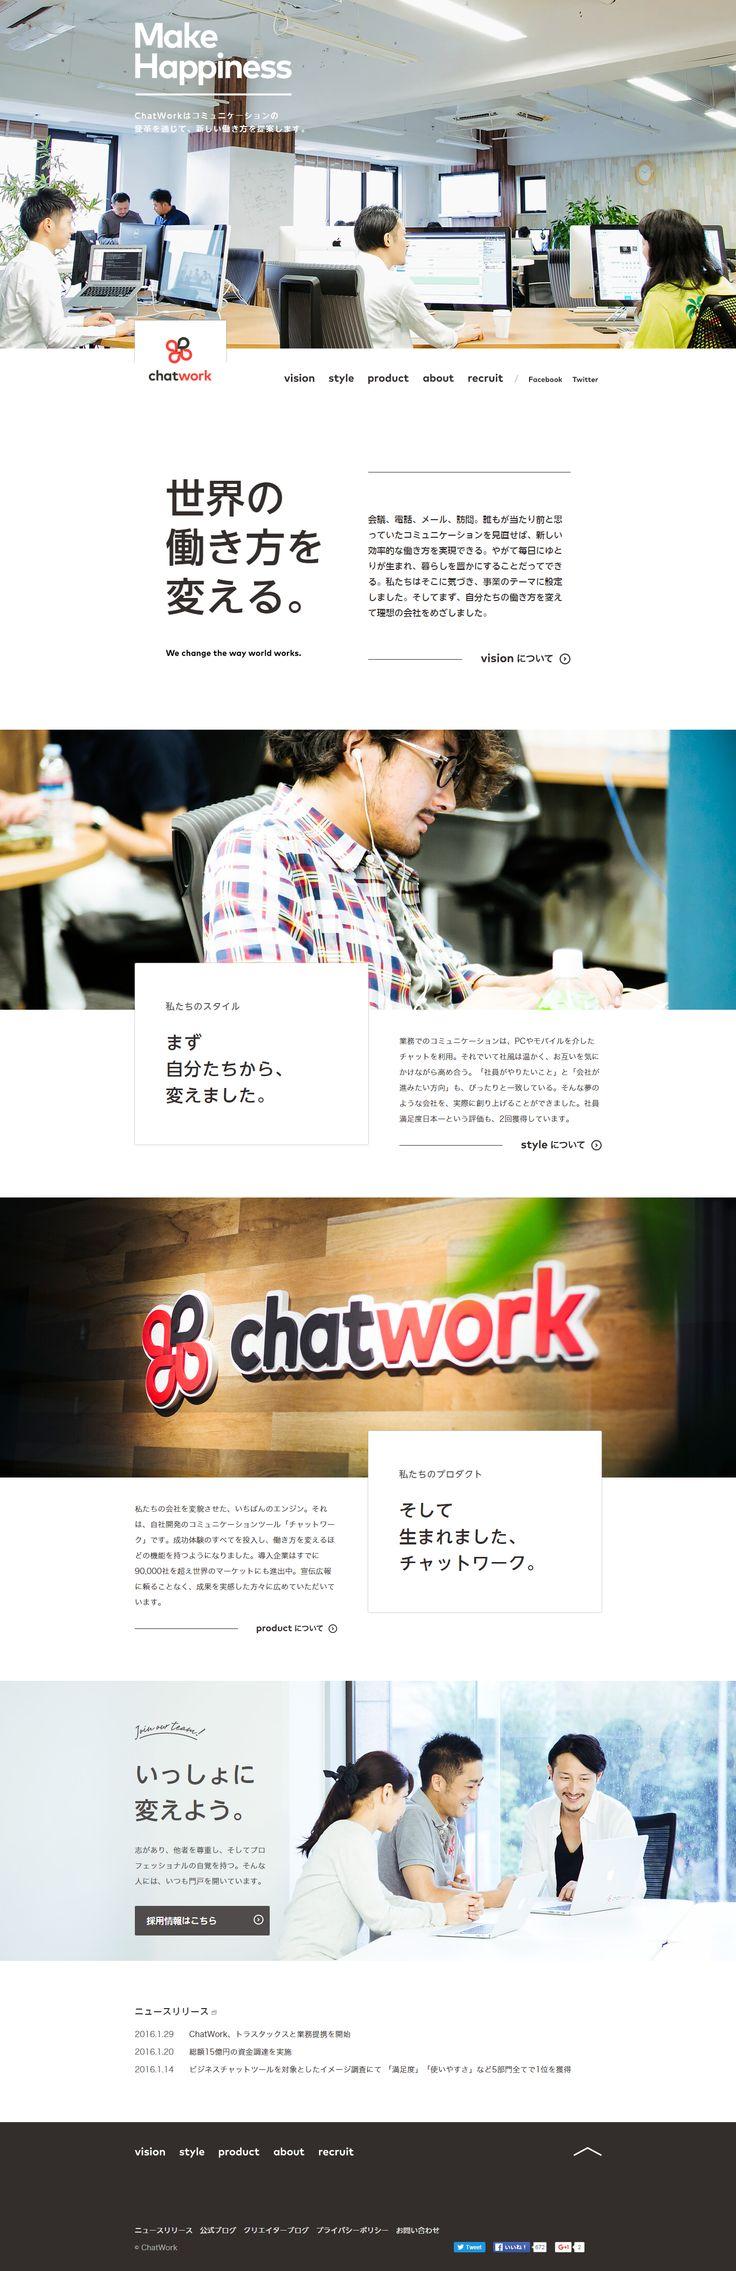 http://corp.chatwork.com/ja/